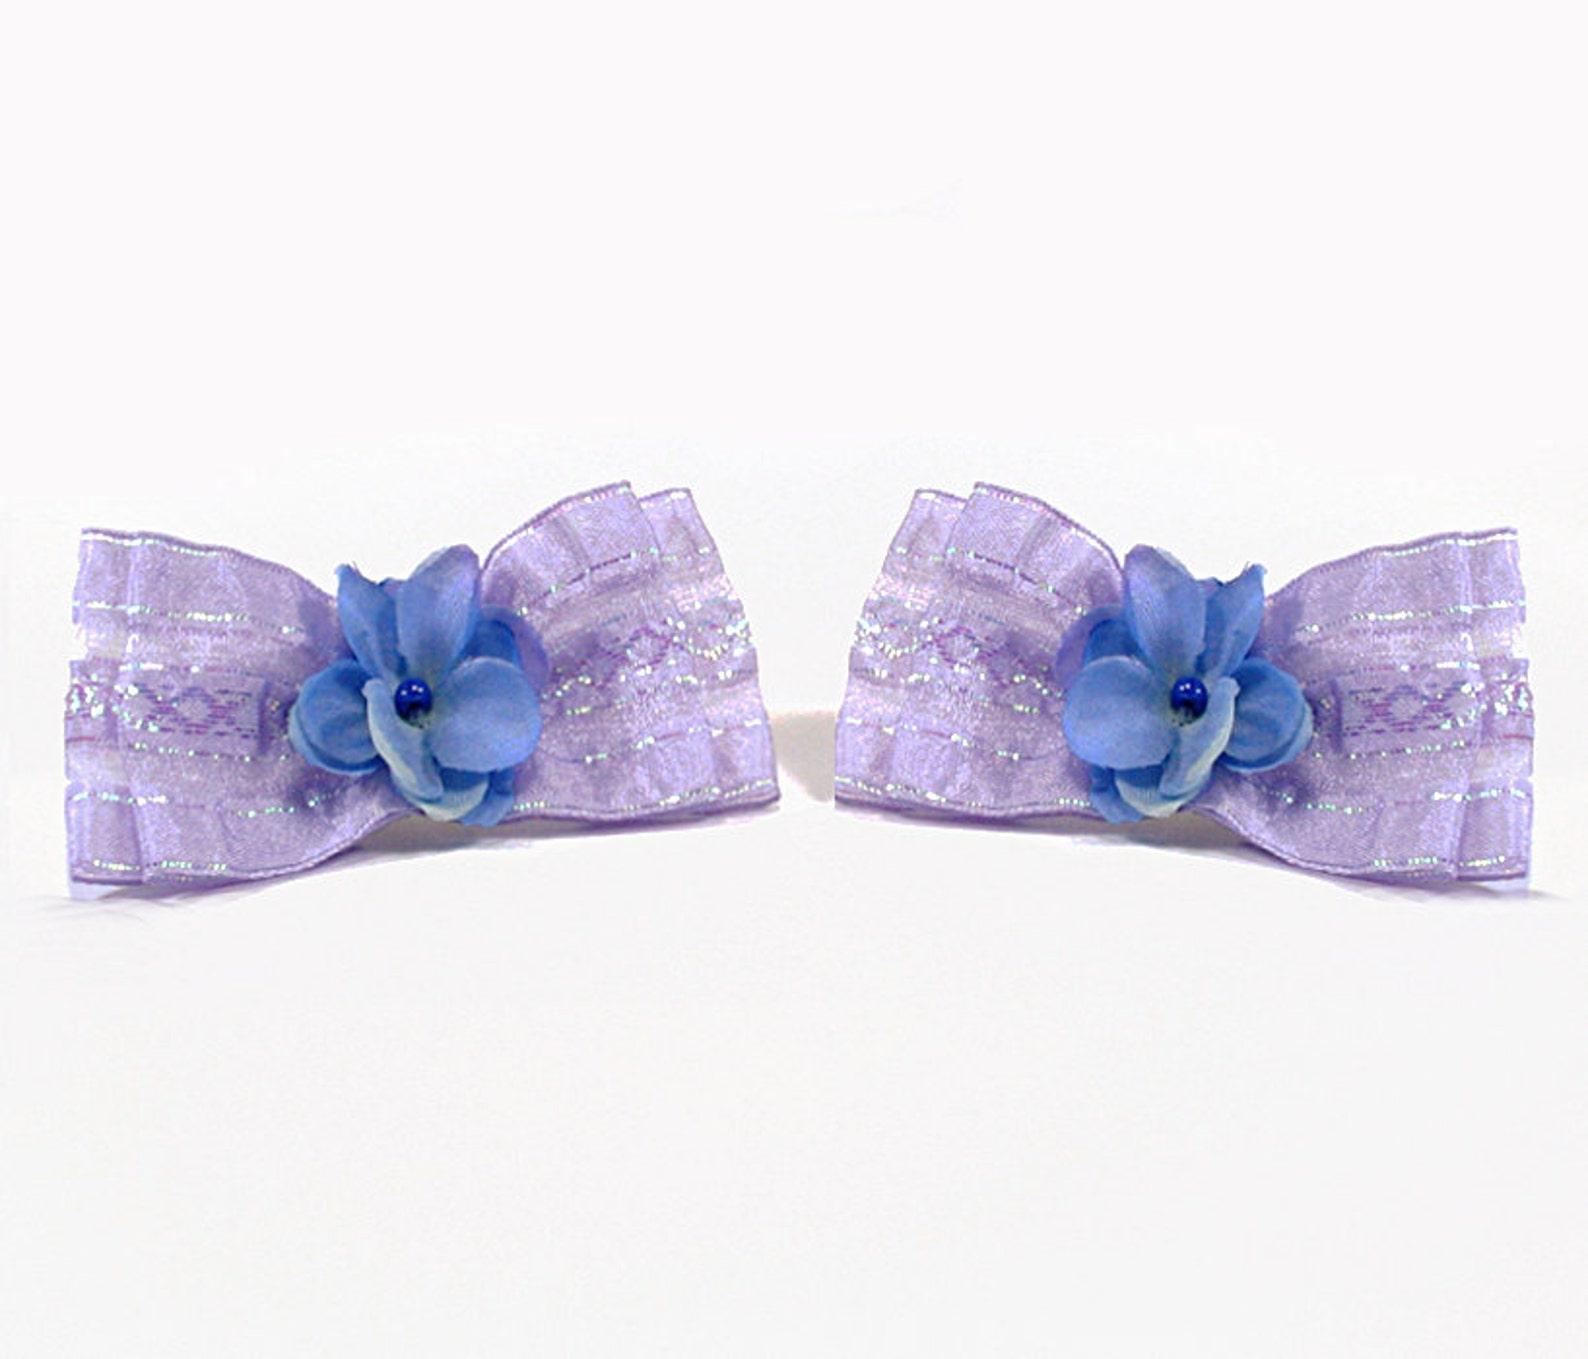 purple lavendar flower bow shoe clips, easter shoe clips, clips for flip flops, high heels, sandles and ballet flats, bridesmaid